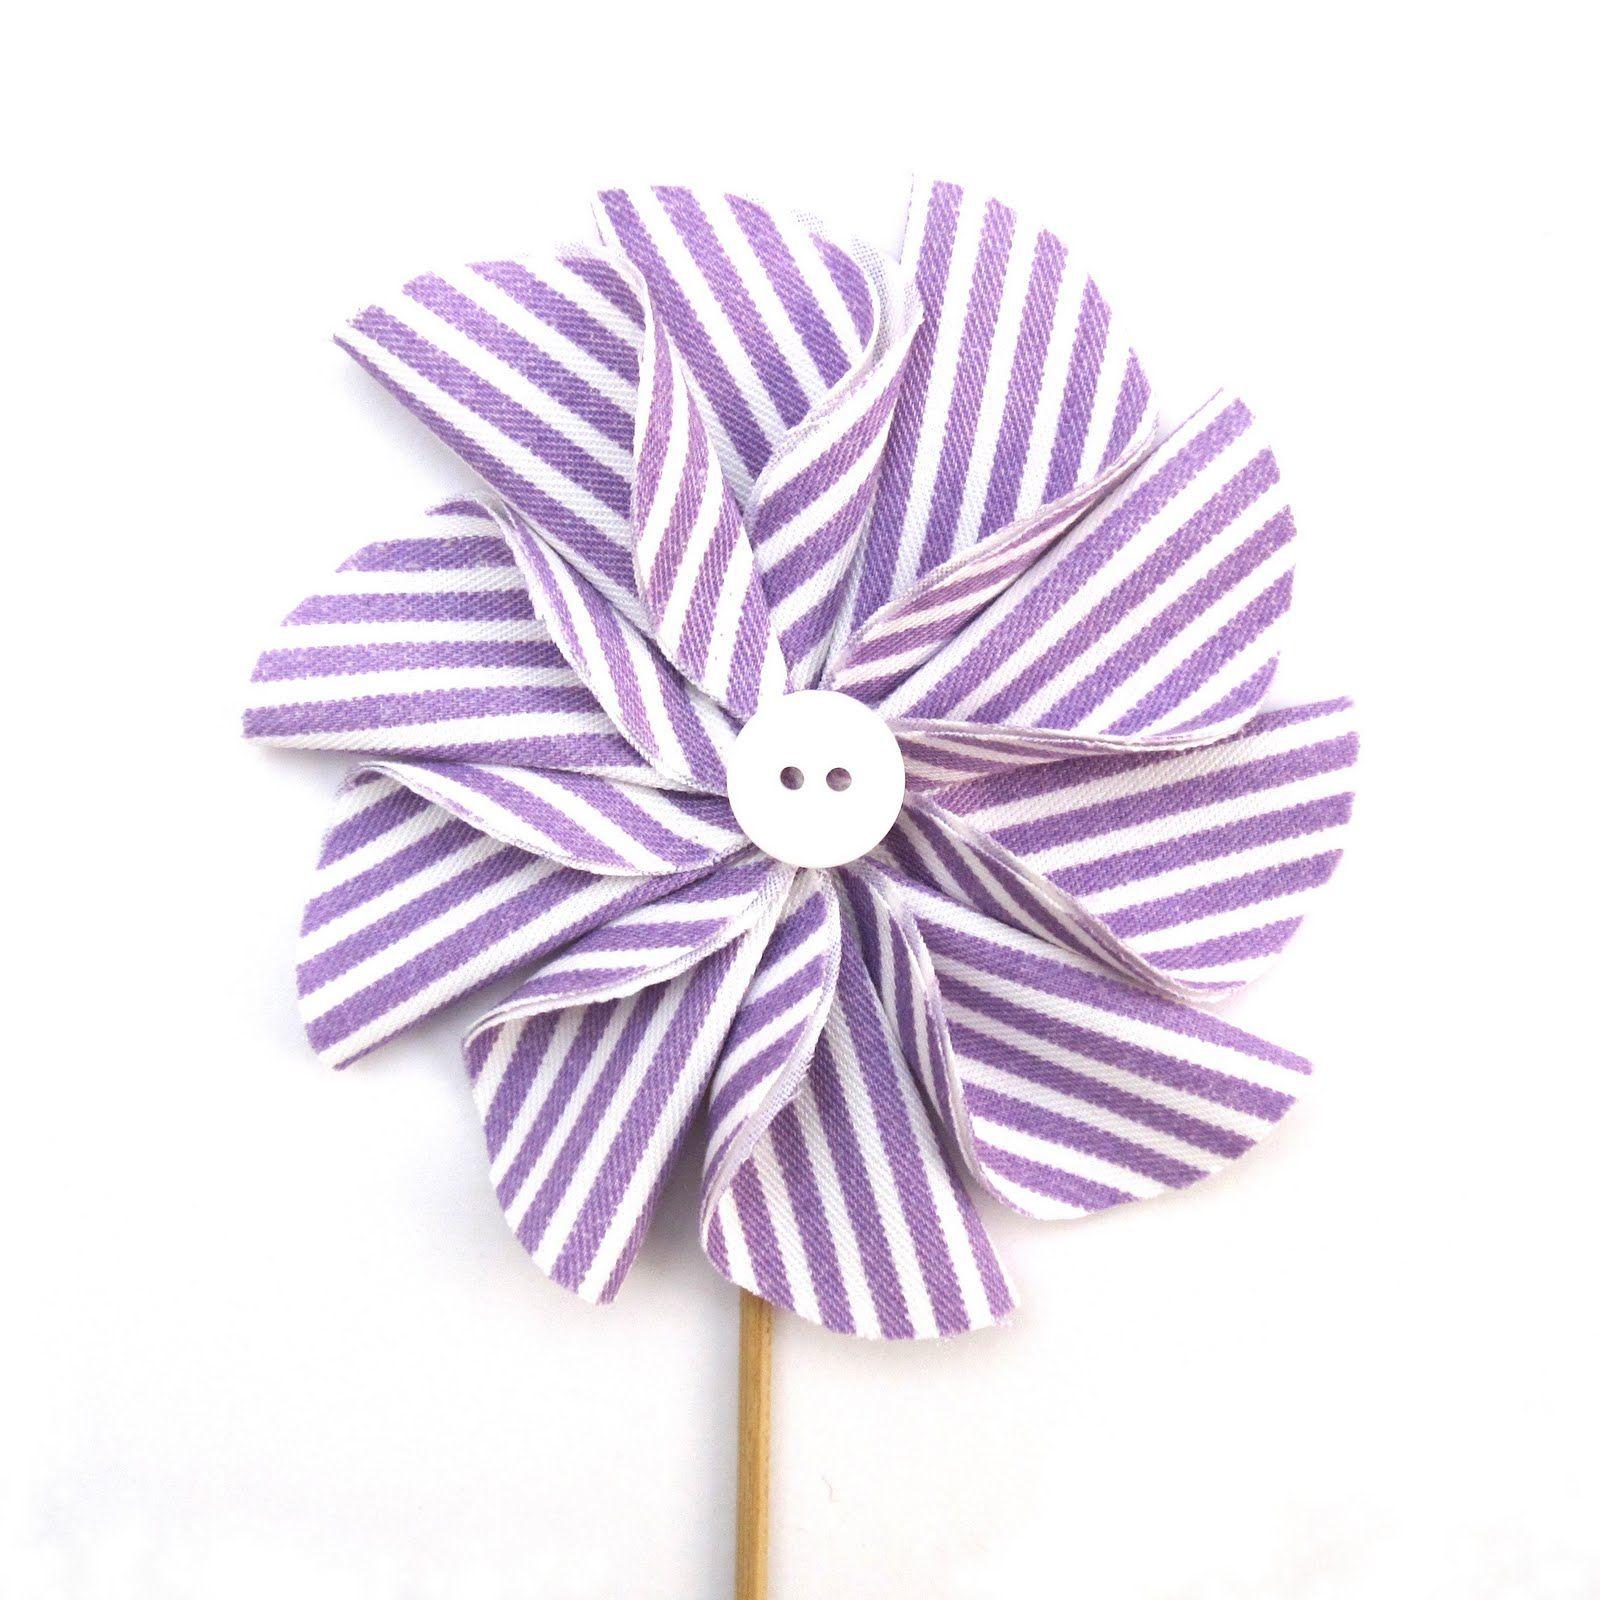 Little Livingstone How To Make A Fabric Pinwheel Flower Hair